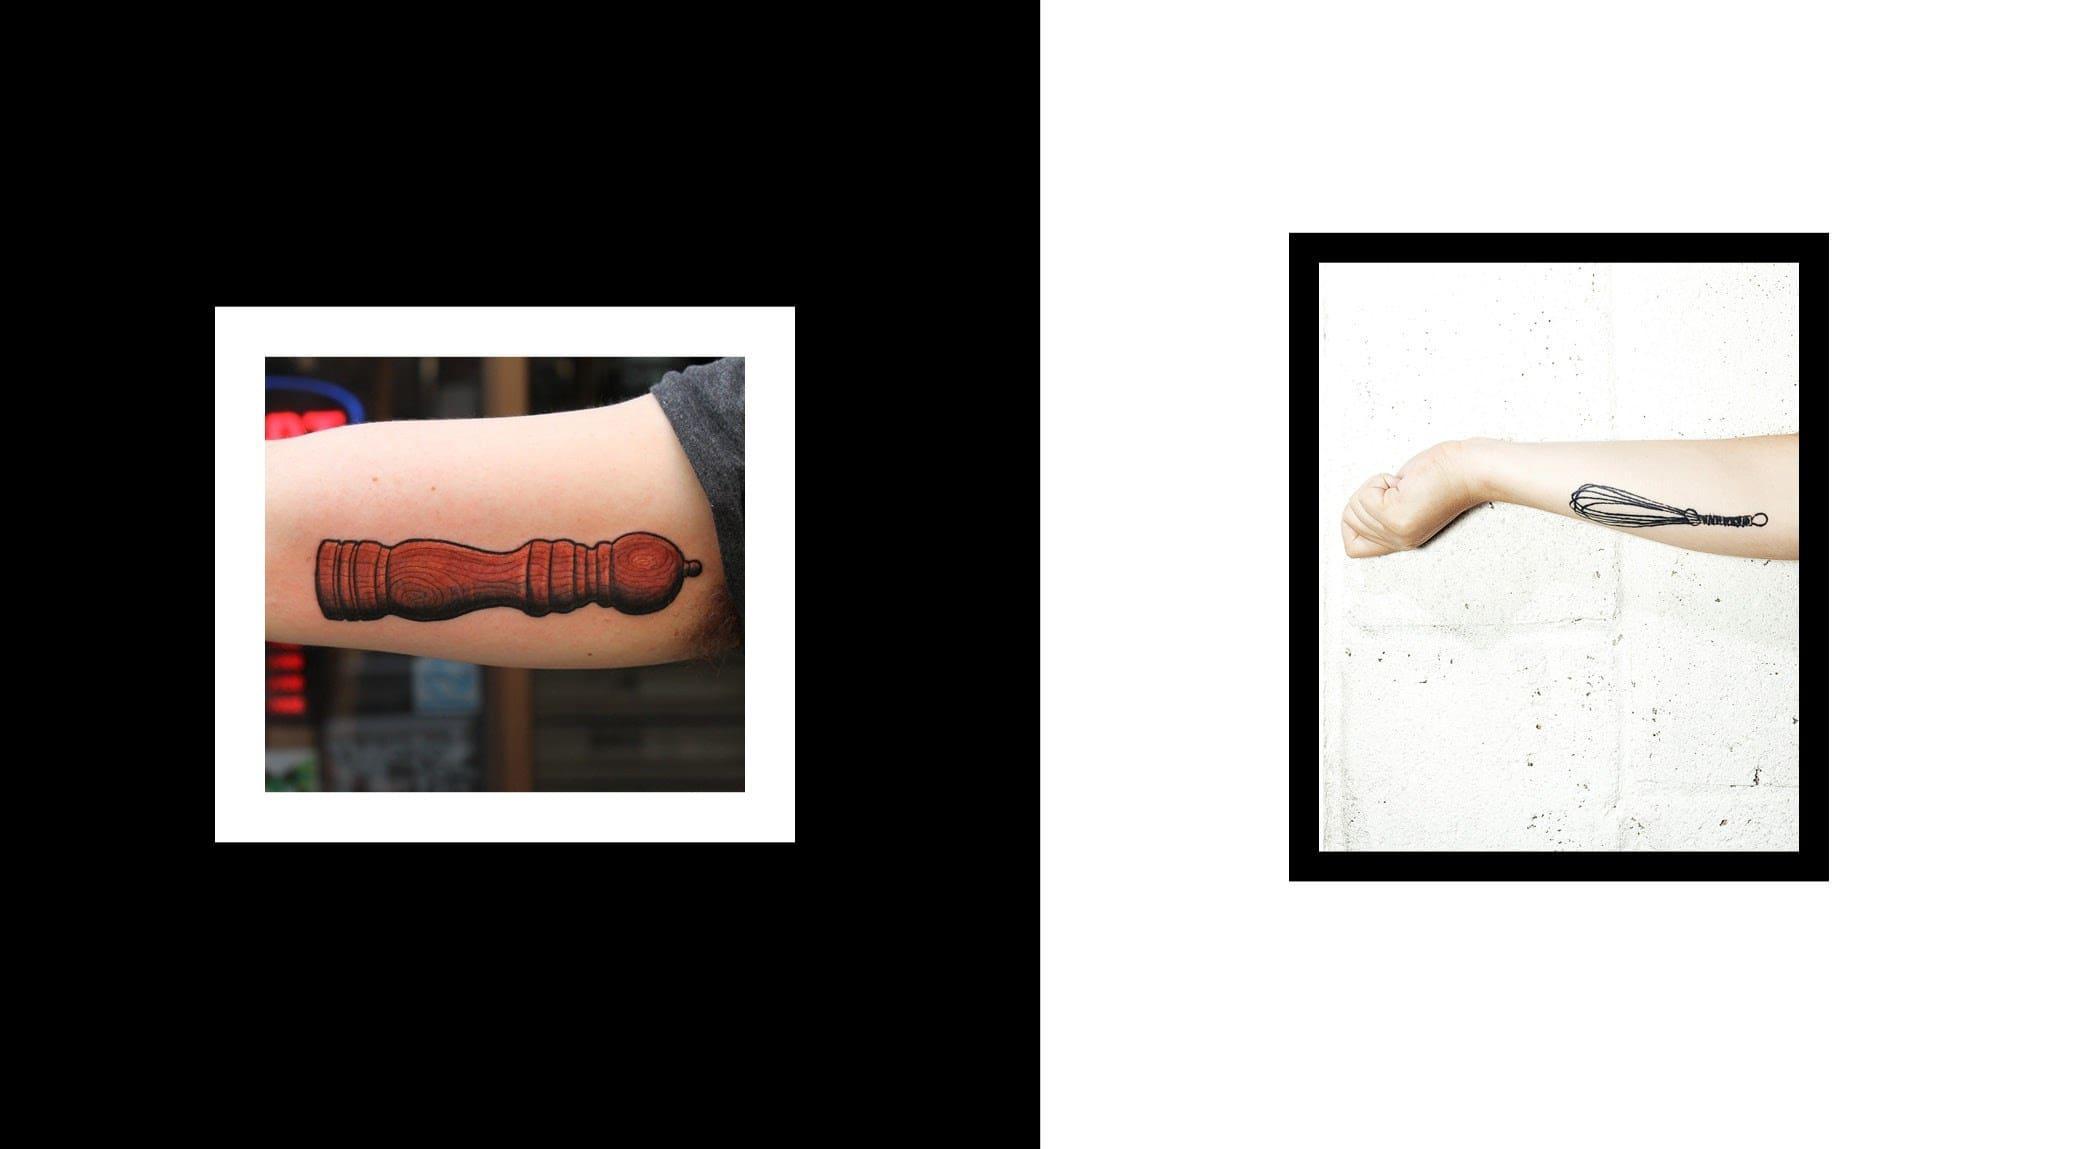 original_004-tattoo-finedininglovers4.jpg